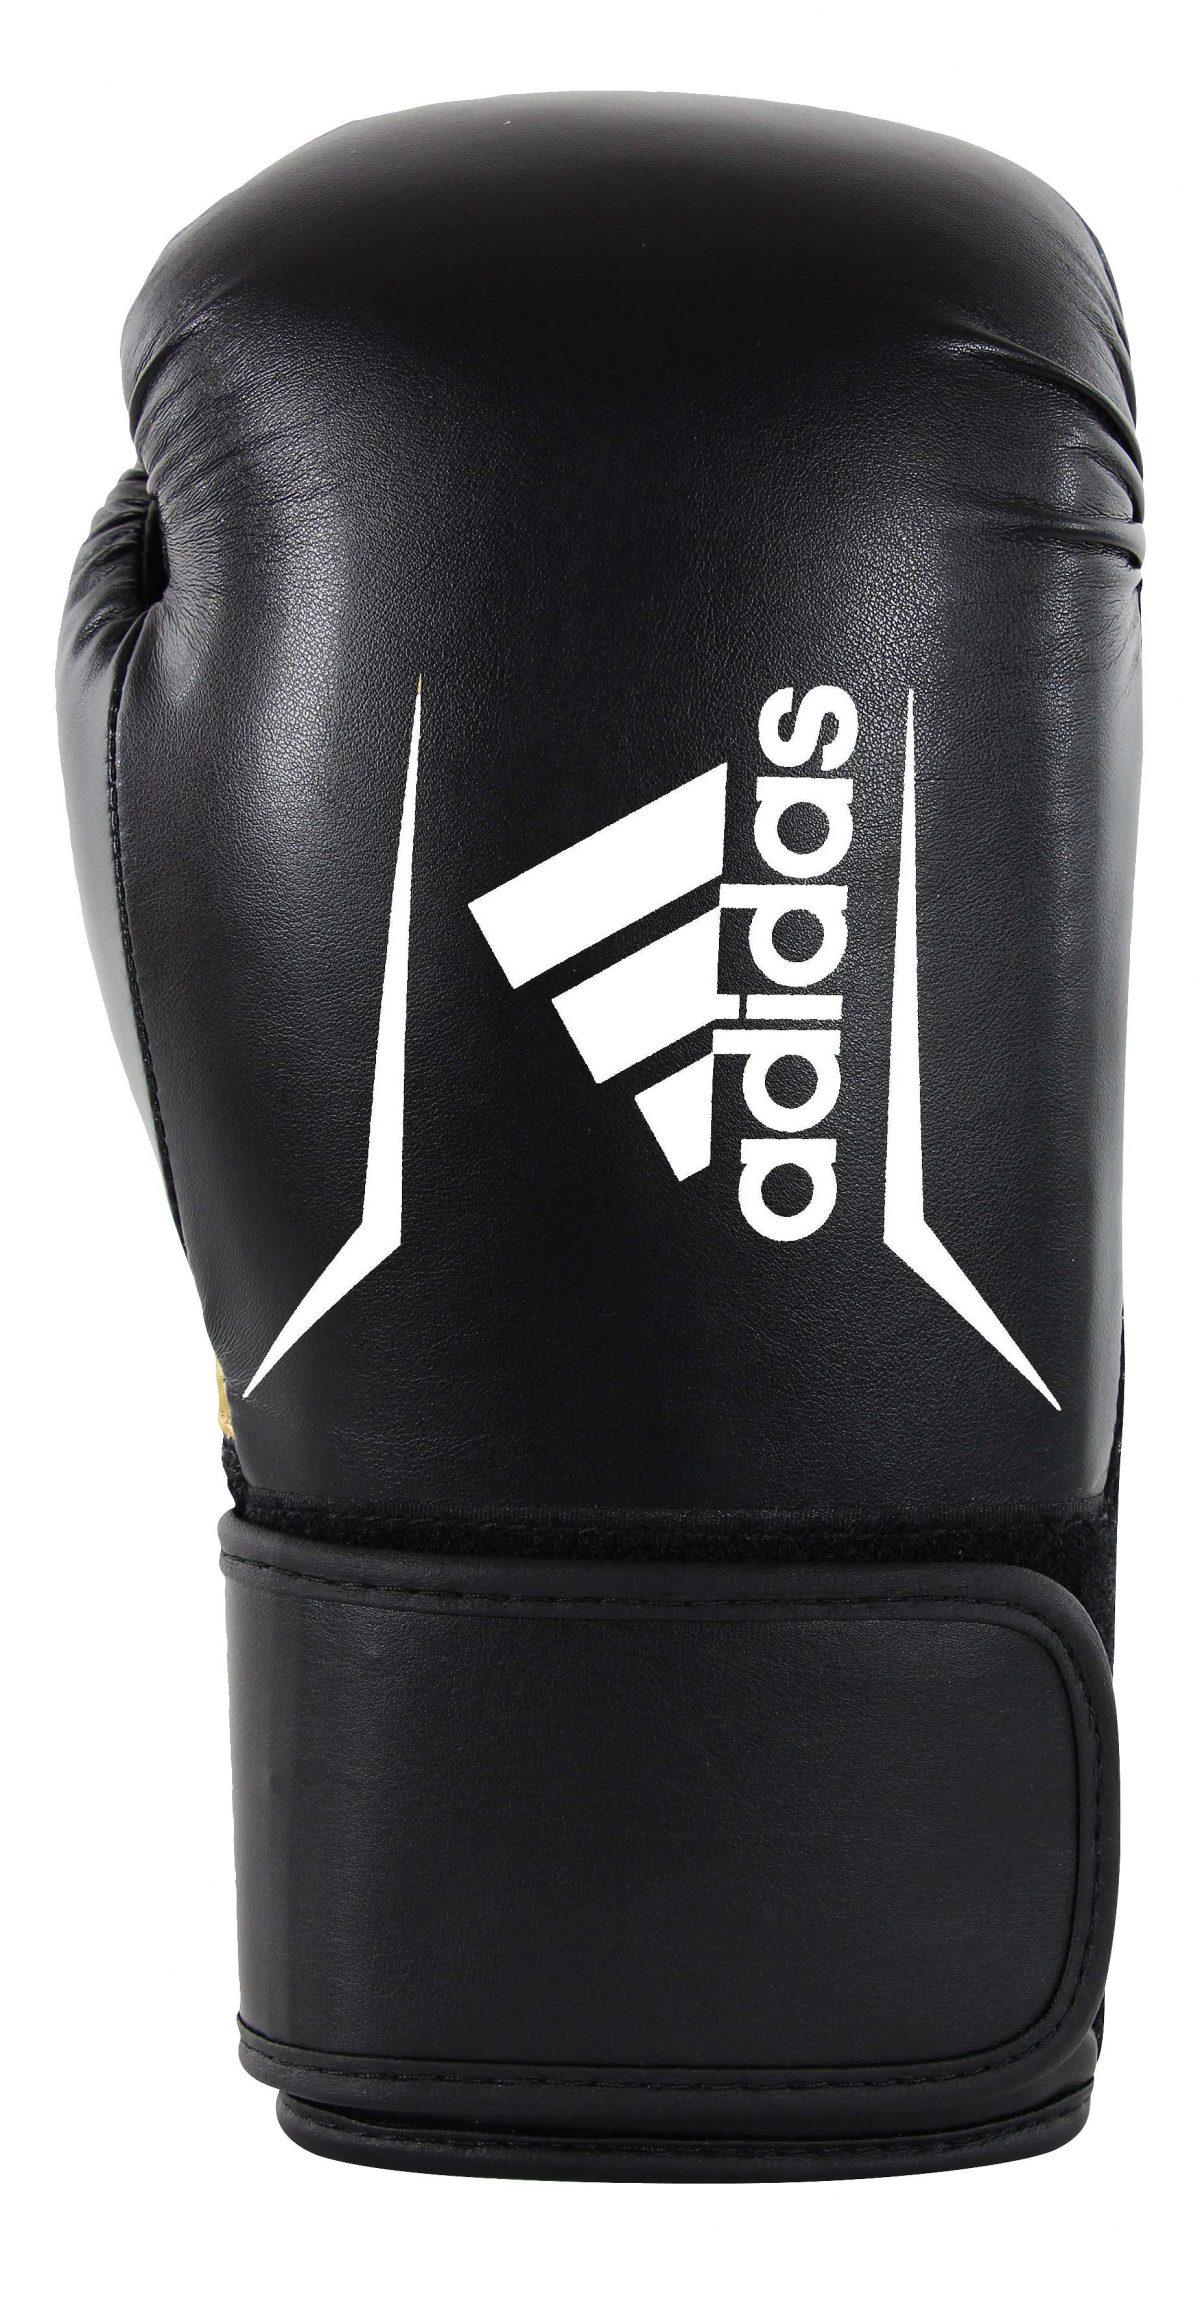 "Adidas Boxhandschuhe ""Speed 100"""